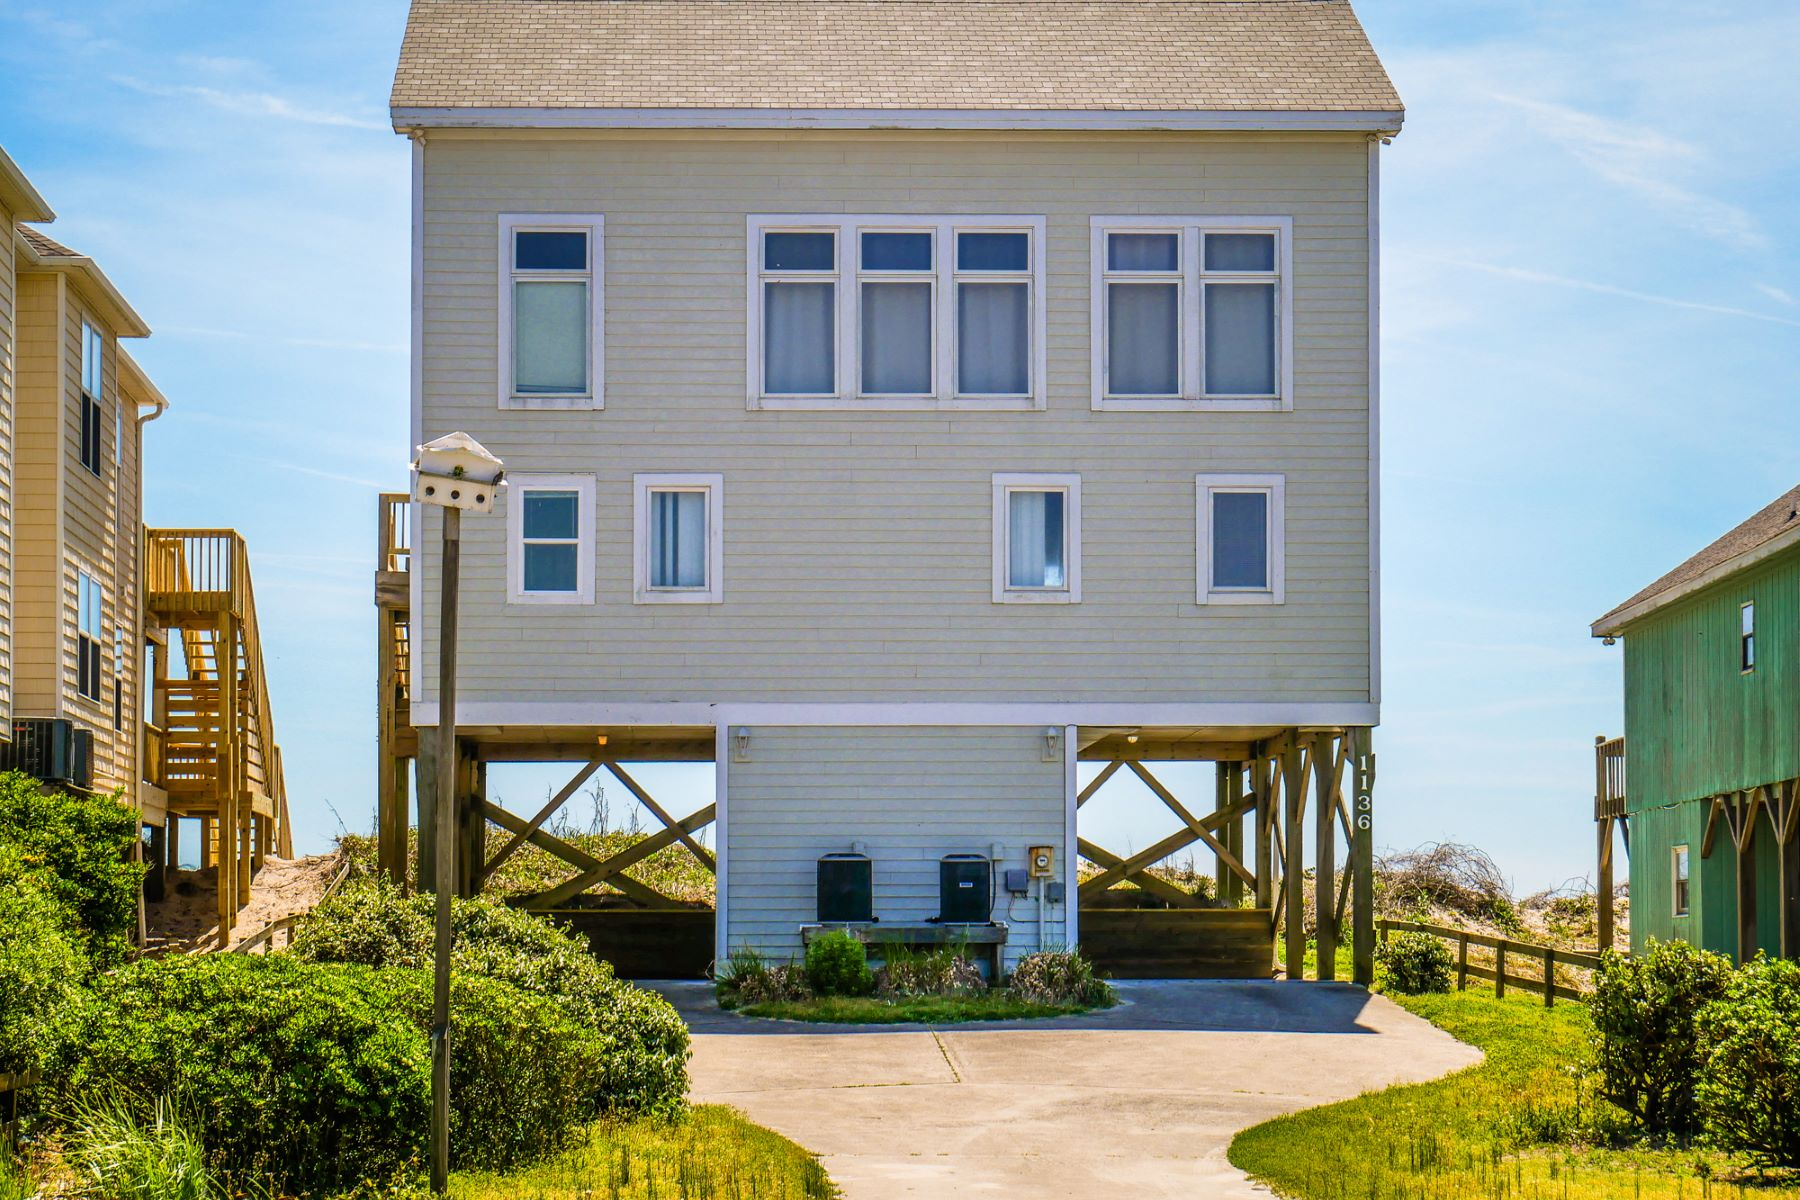 Single Family Homes για την Πώληση στο Oceanfront Home in Coveted Area 1136 S Shore Drive, Surf City, Βορεια Καρολινα 28445 Ηνωμένες Πολιτείες